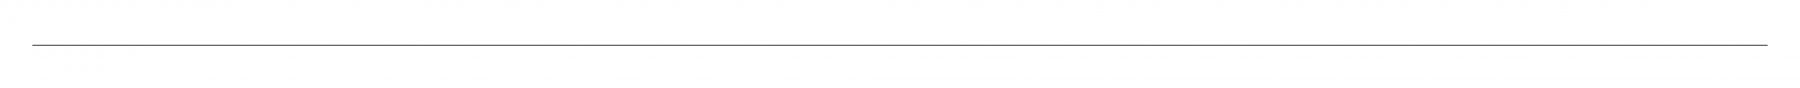 thin line 1 pt